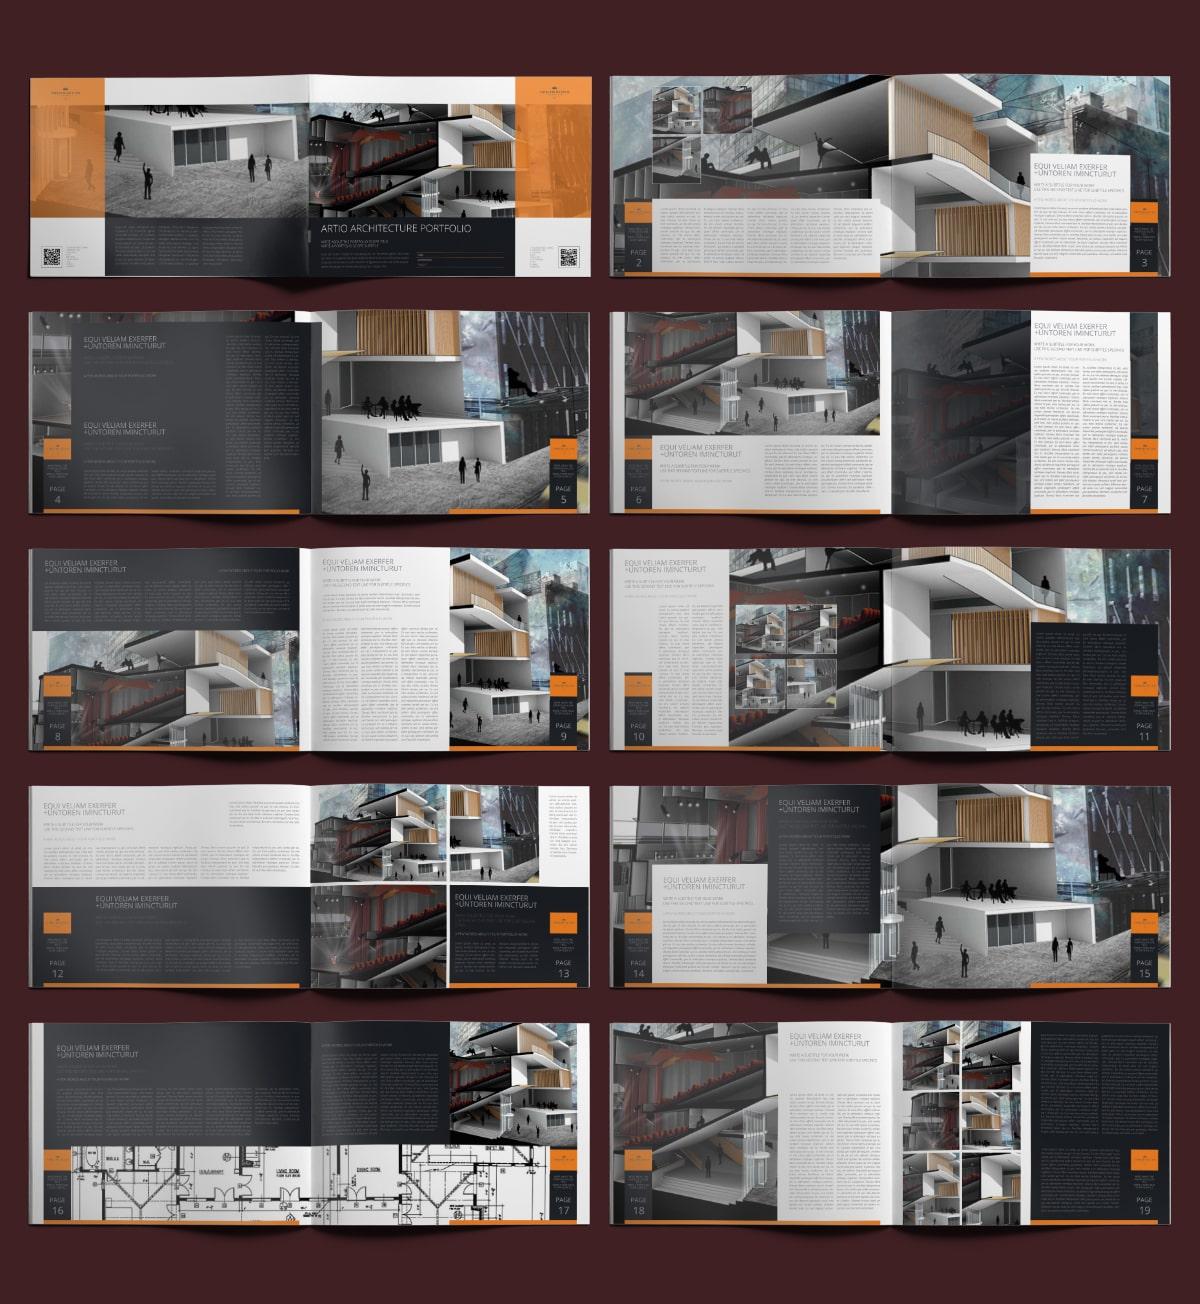 Artio Architecture Portfolio A4 Landscape - Layouts